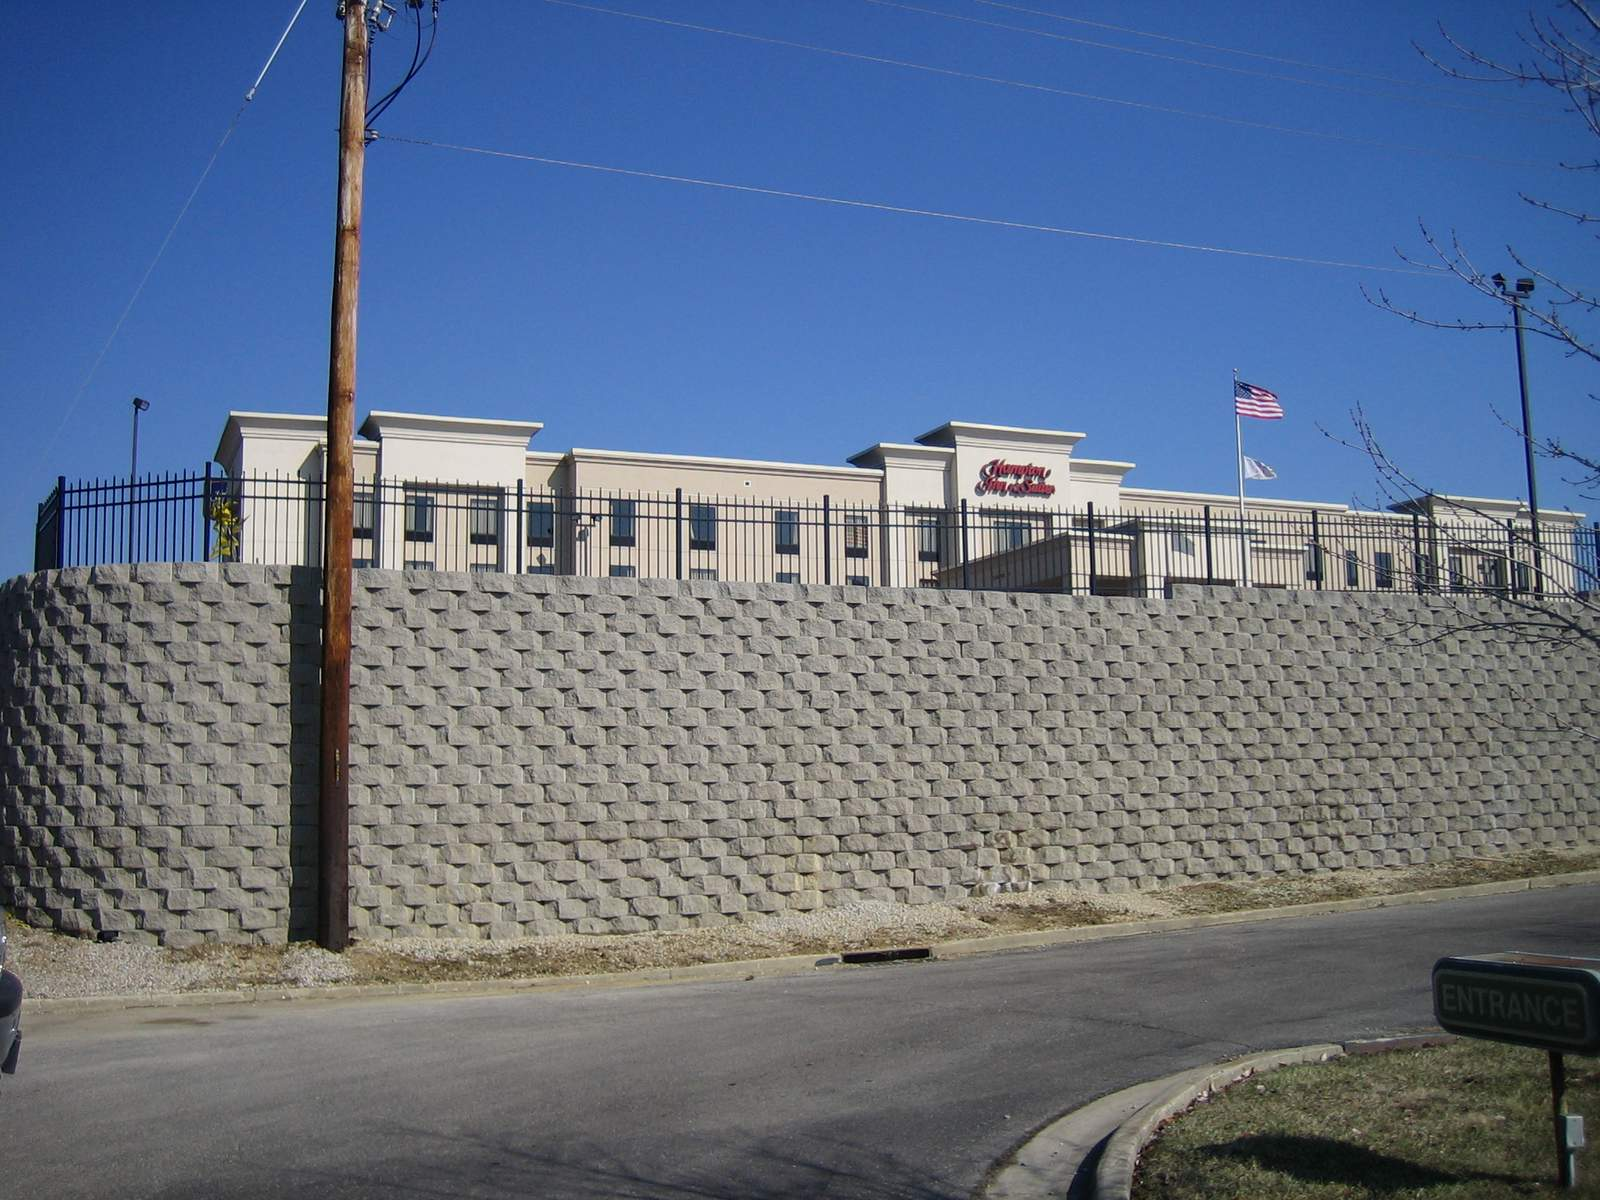 Hampton Inn - Dayton, OH